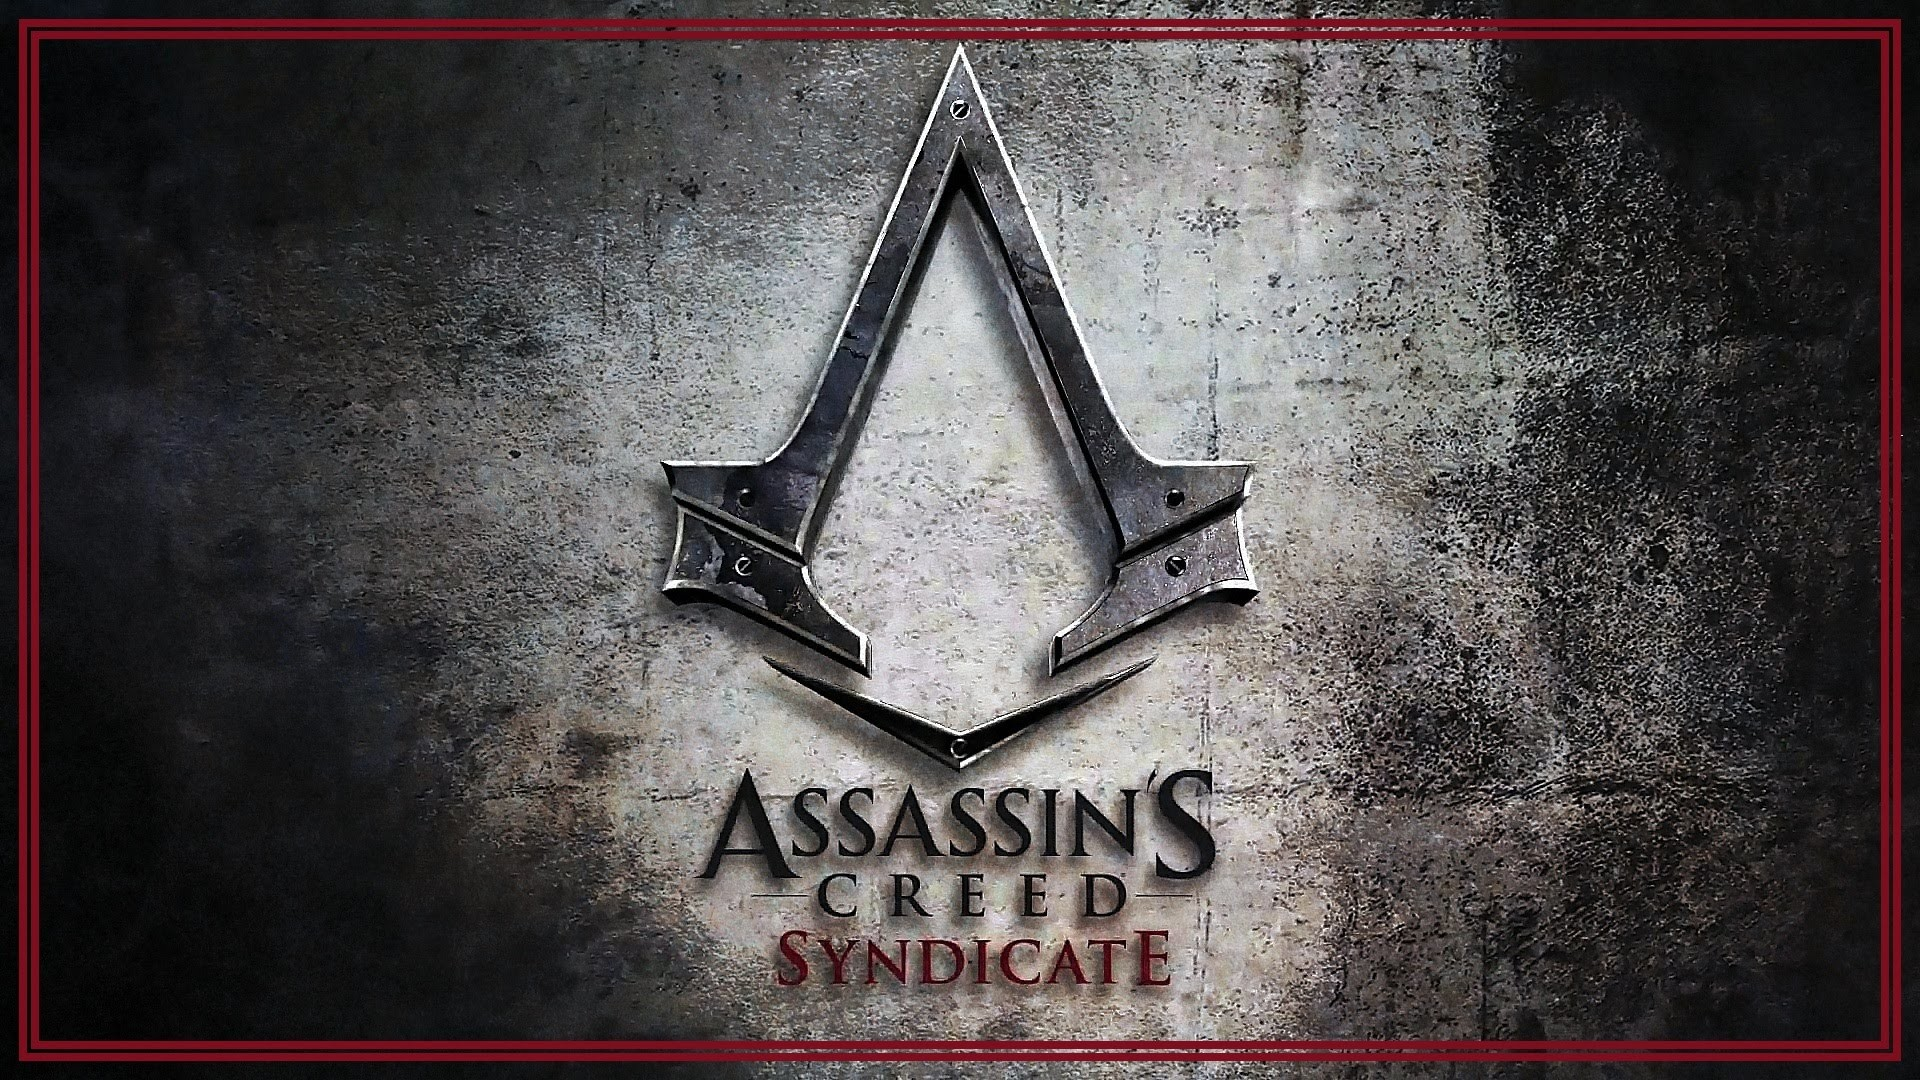 Assassins Creed Wallpaper 1080p: Assassins Creed Logo Wallpaper (78+ Images